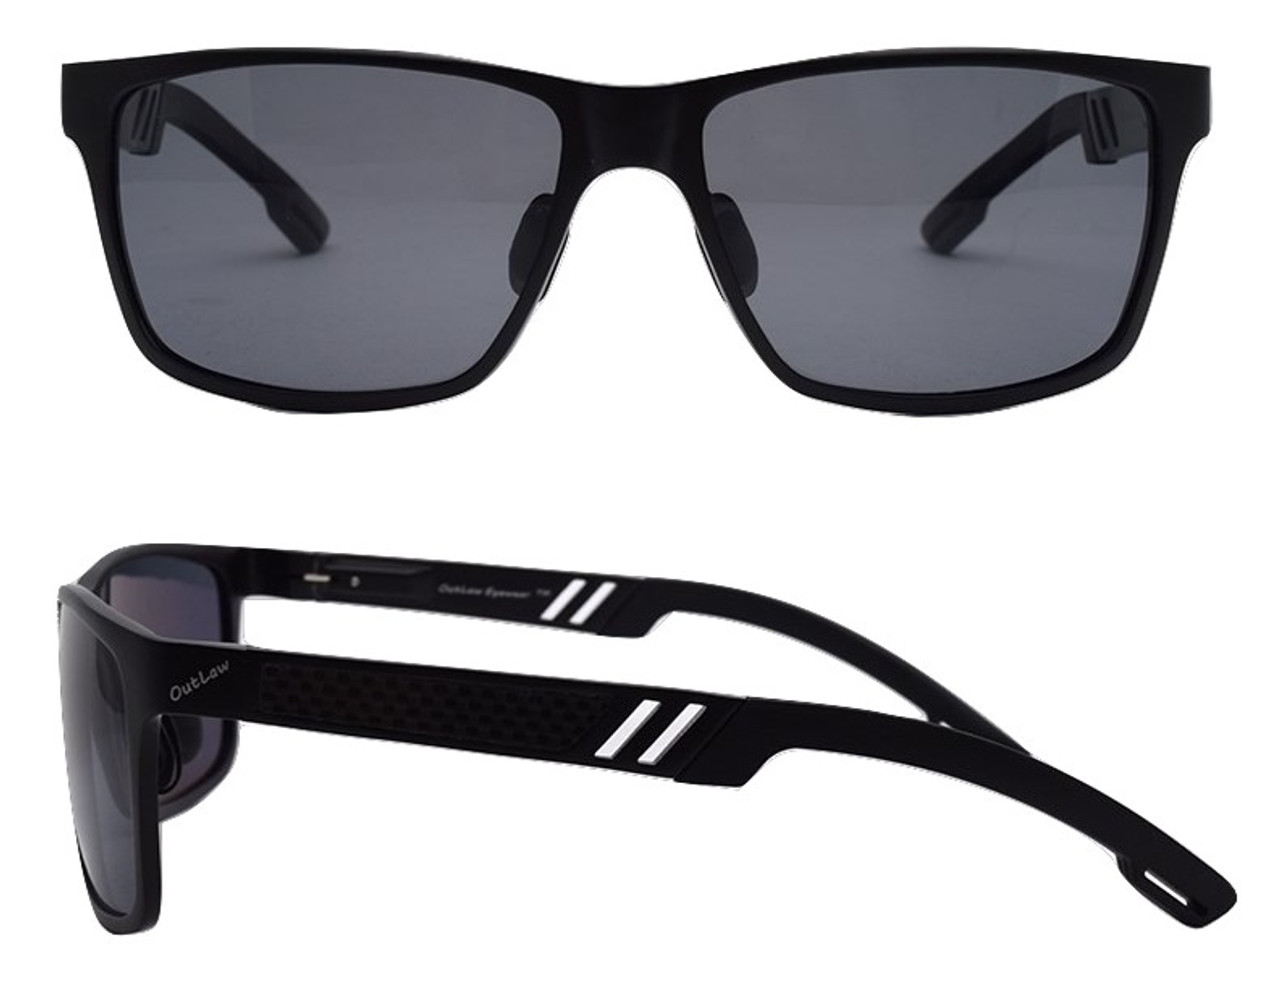 22f30f62aed OutLaw Eyewear Wayfarer Mg sunglass Black frame with Polarized Gray lenses